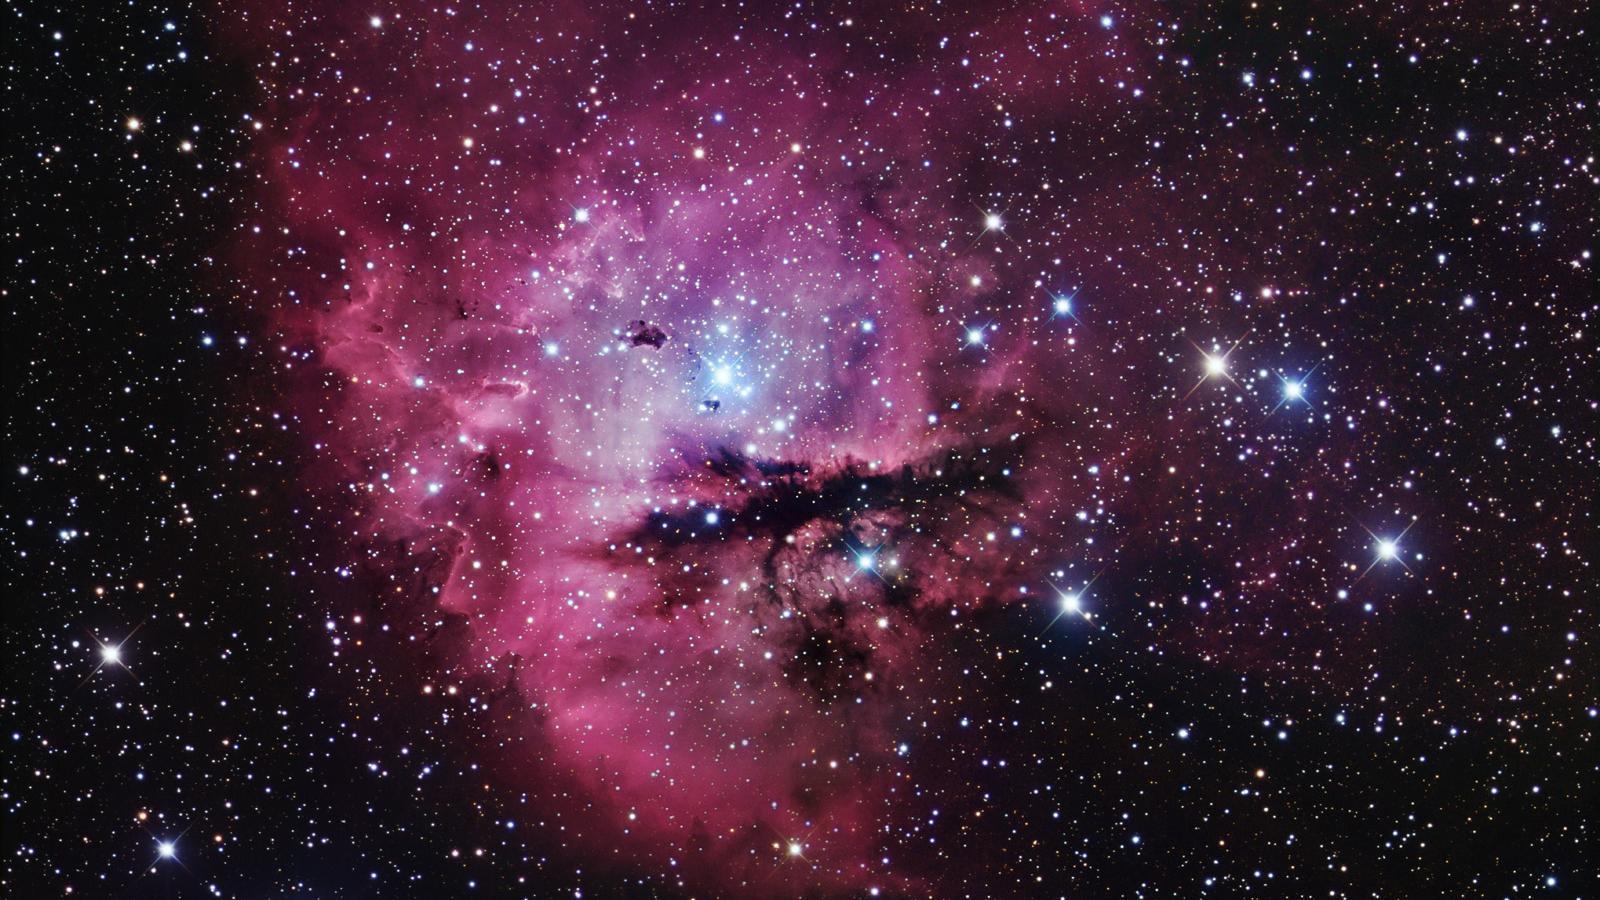 nebula desktop wallpaper - photo #4